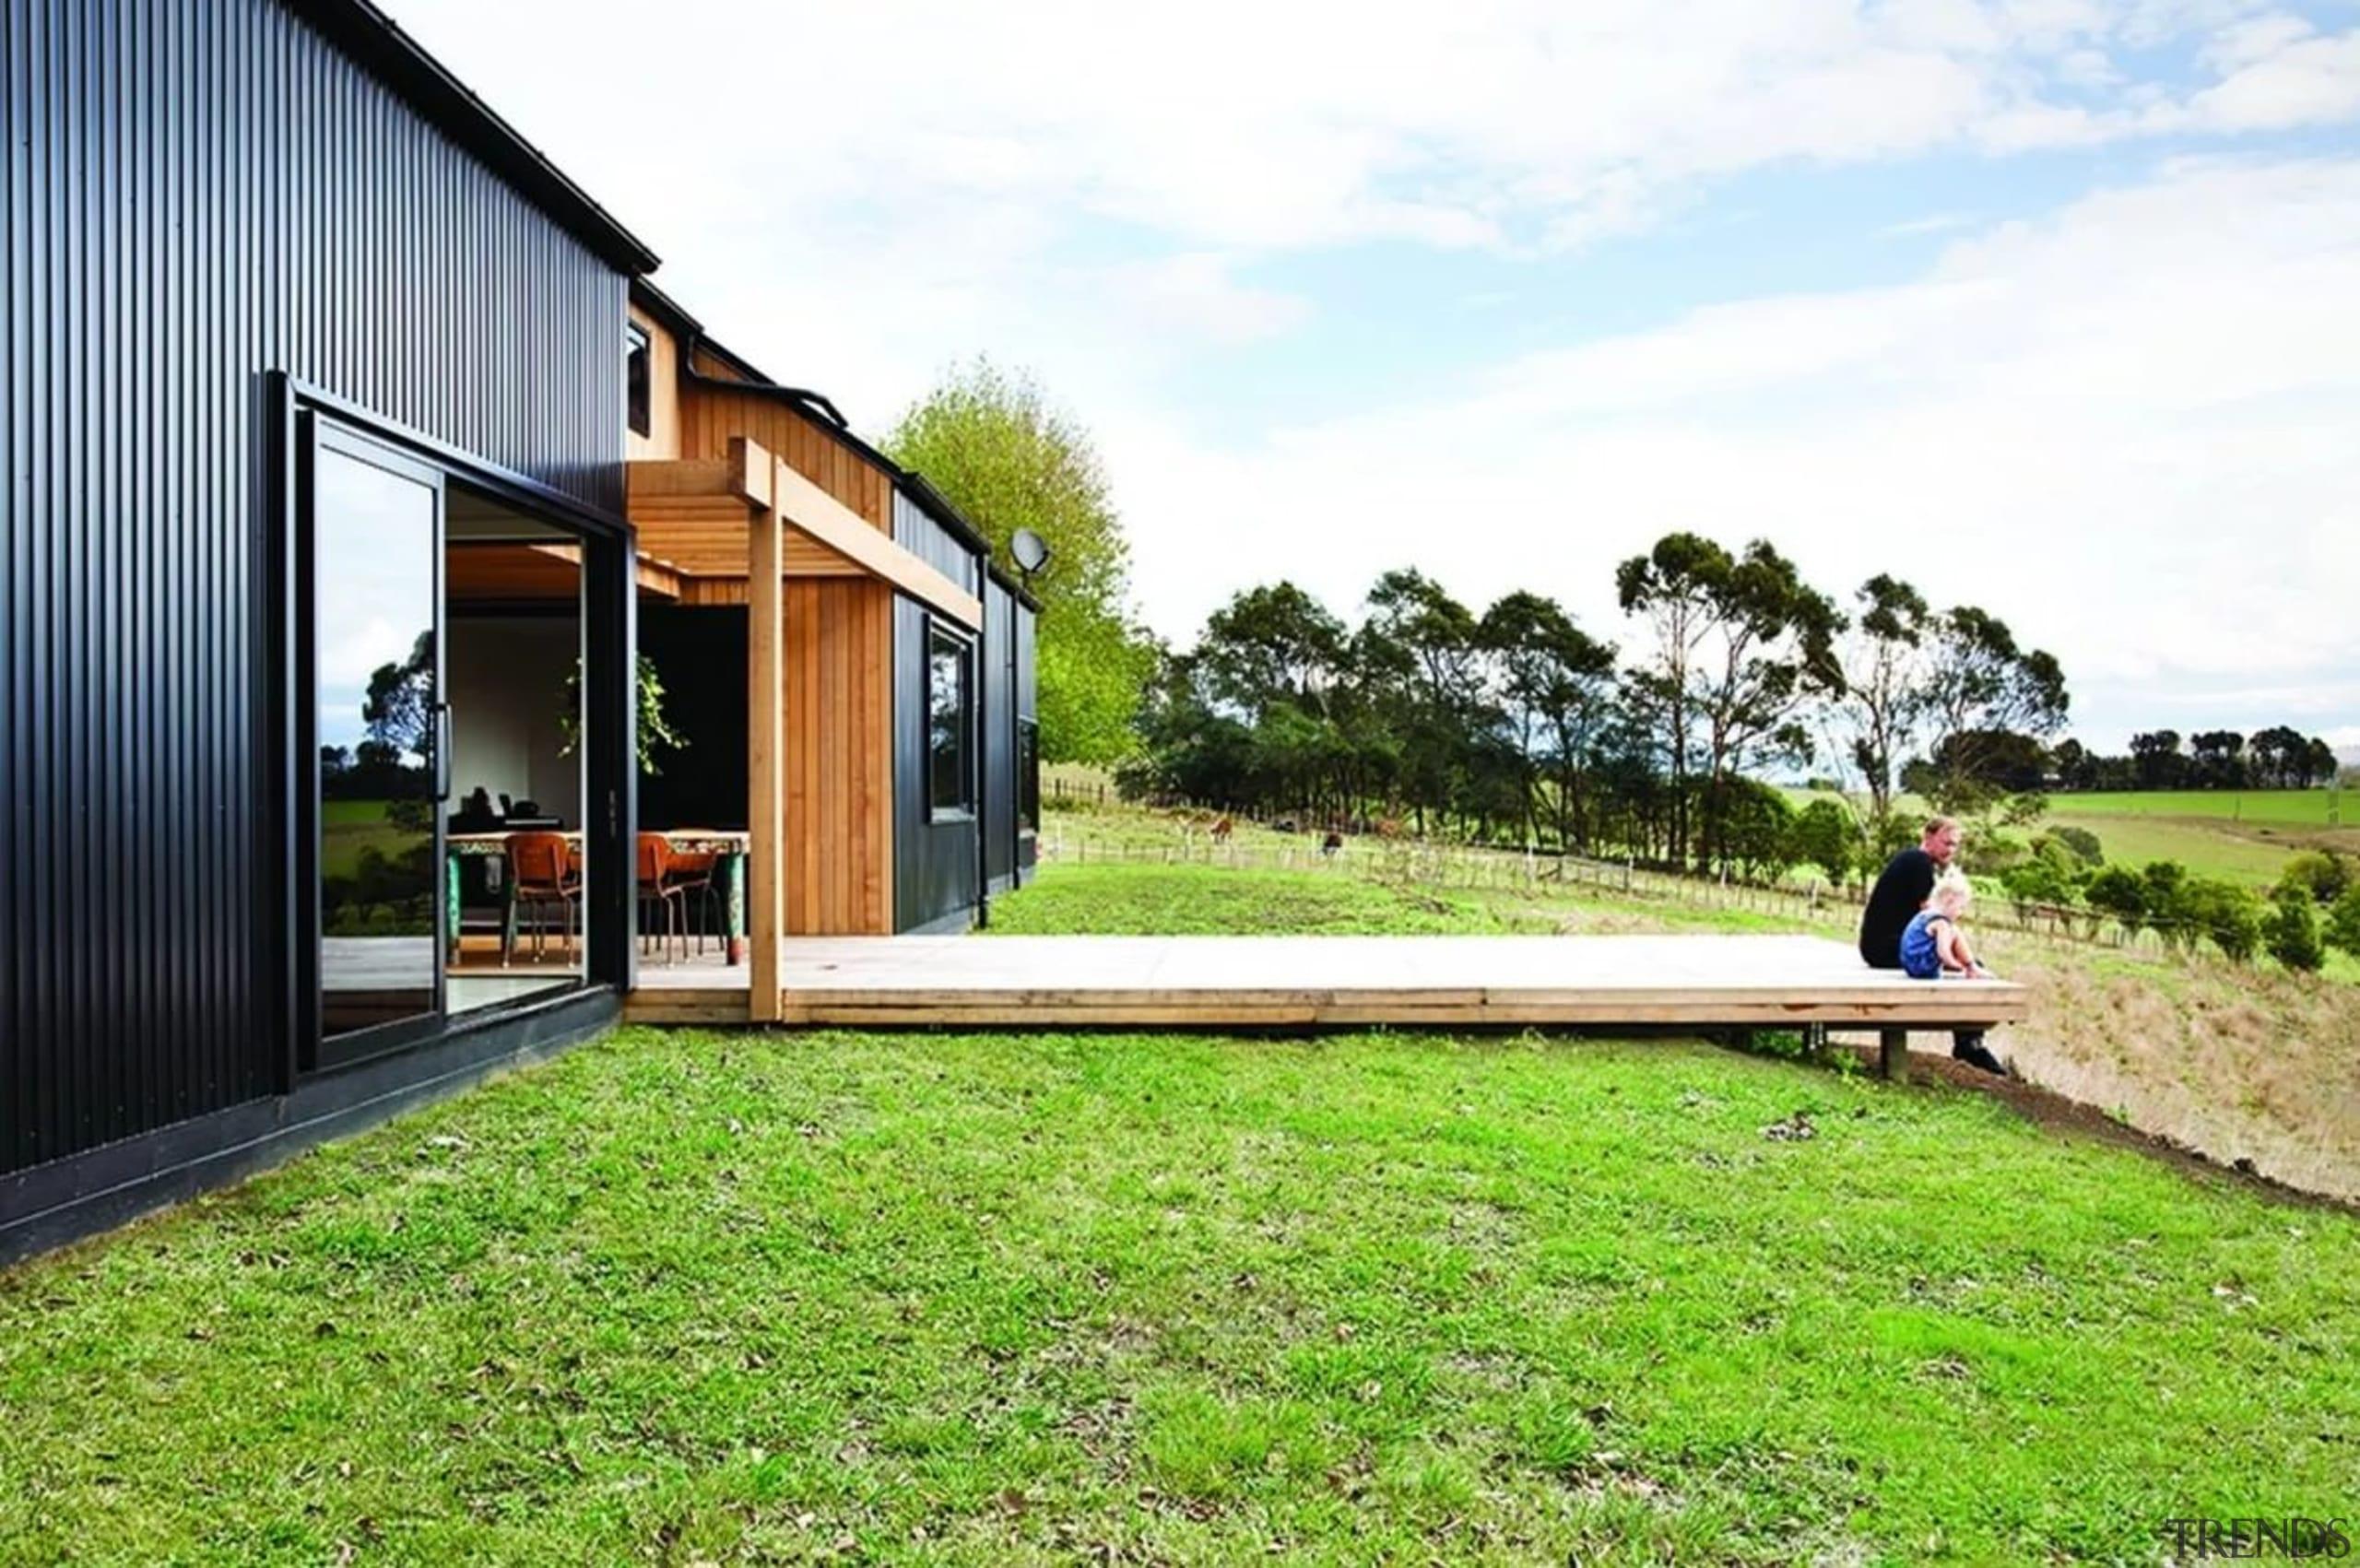 Dimondclad Rib2 - Dimondclad Rib2 - architecture | architecture, cottage, facade, grass, home, house, landscape, lawn, leisure, property, real estate, residential area, yard, white, green